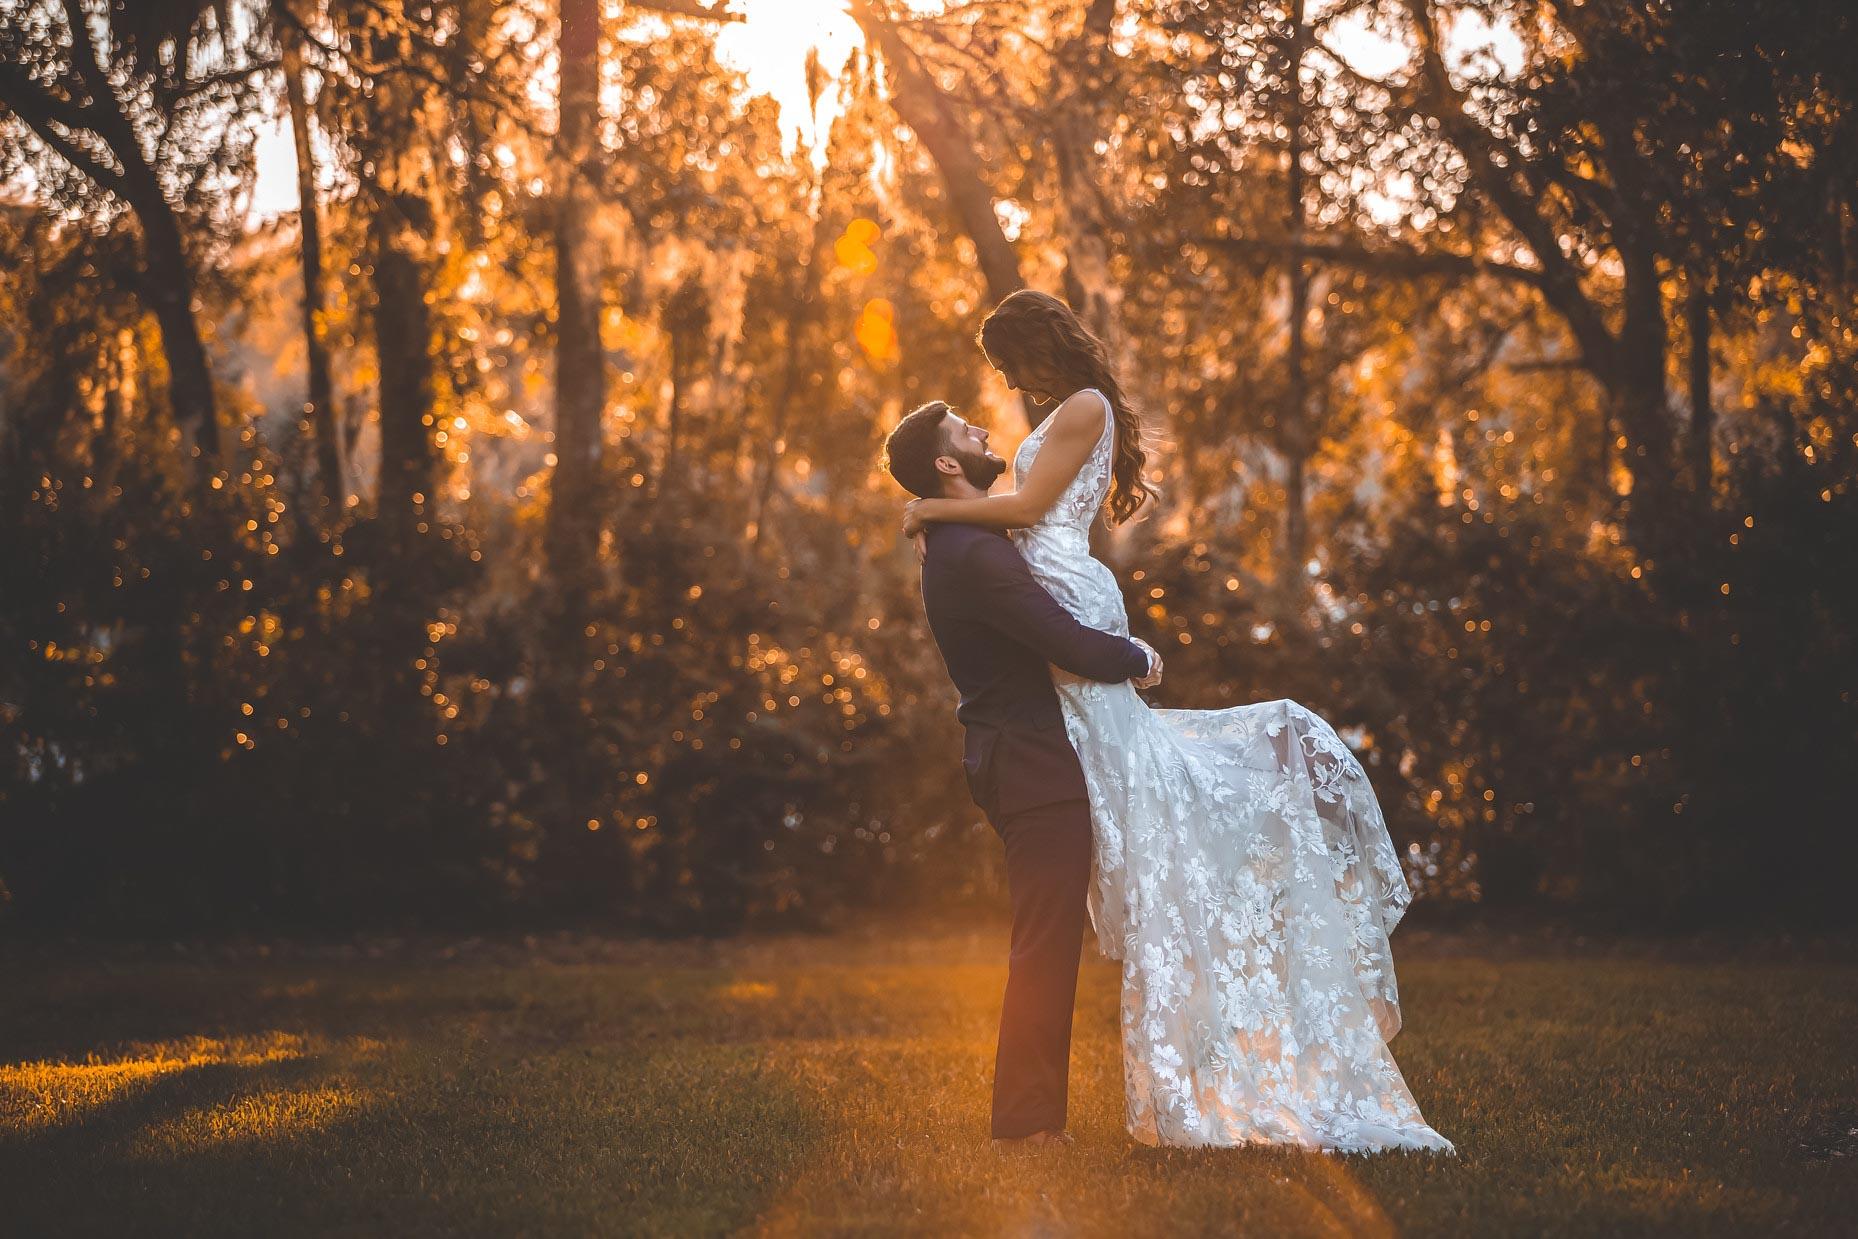 adam-szarmack-bowing-oaks-wedding-photographer-jacksonville-113.jpg